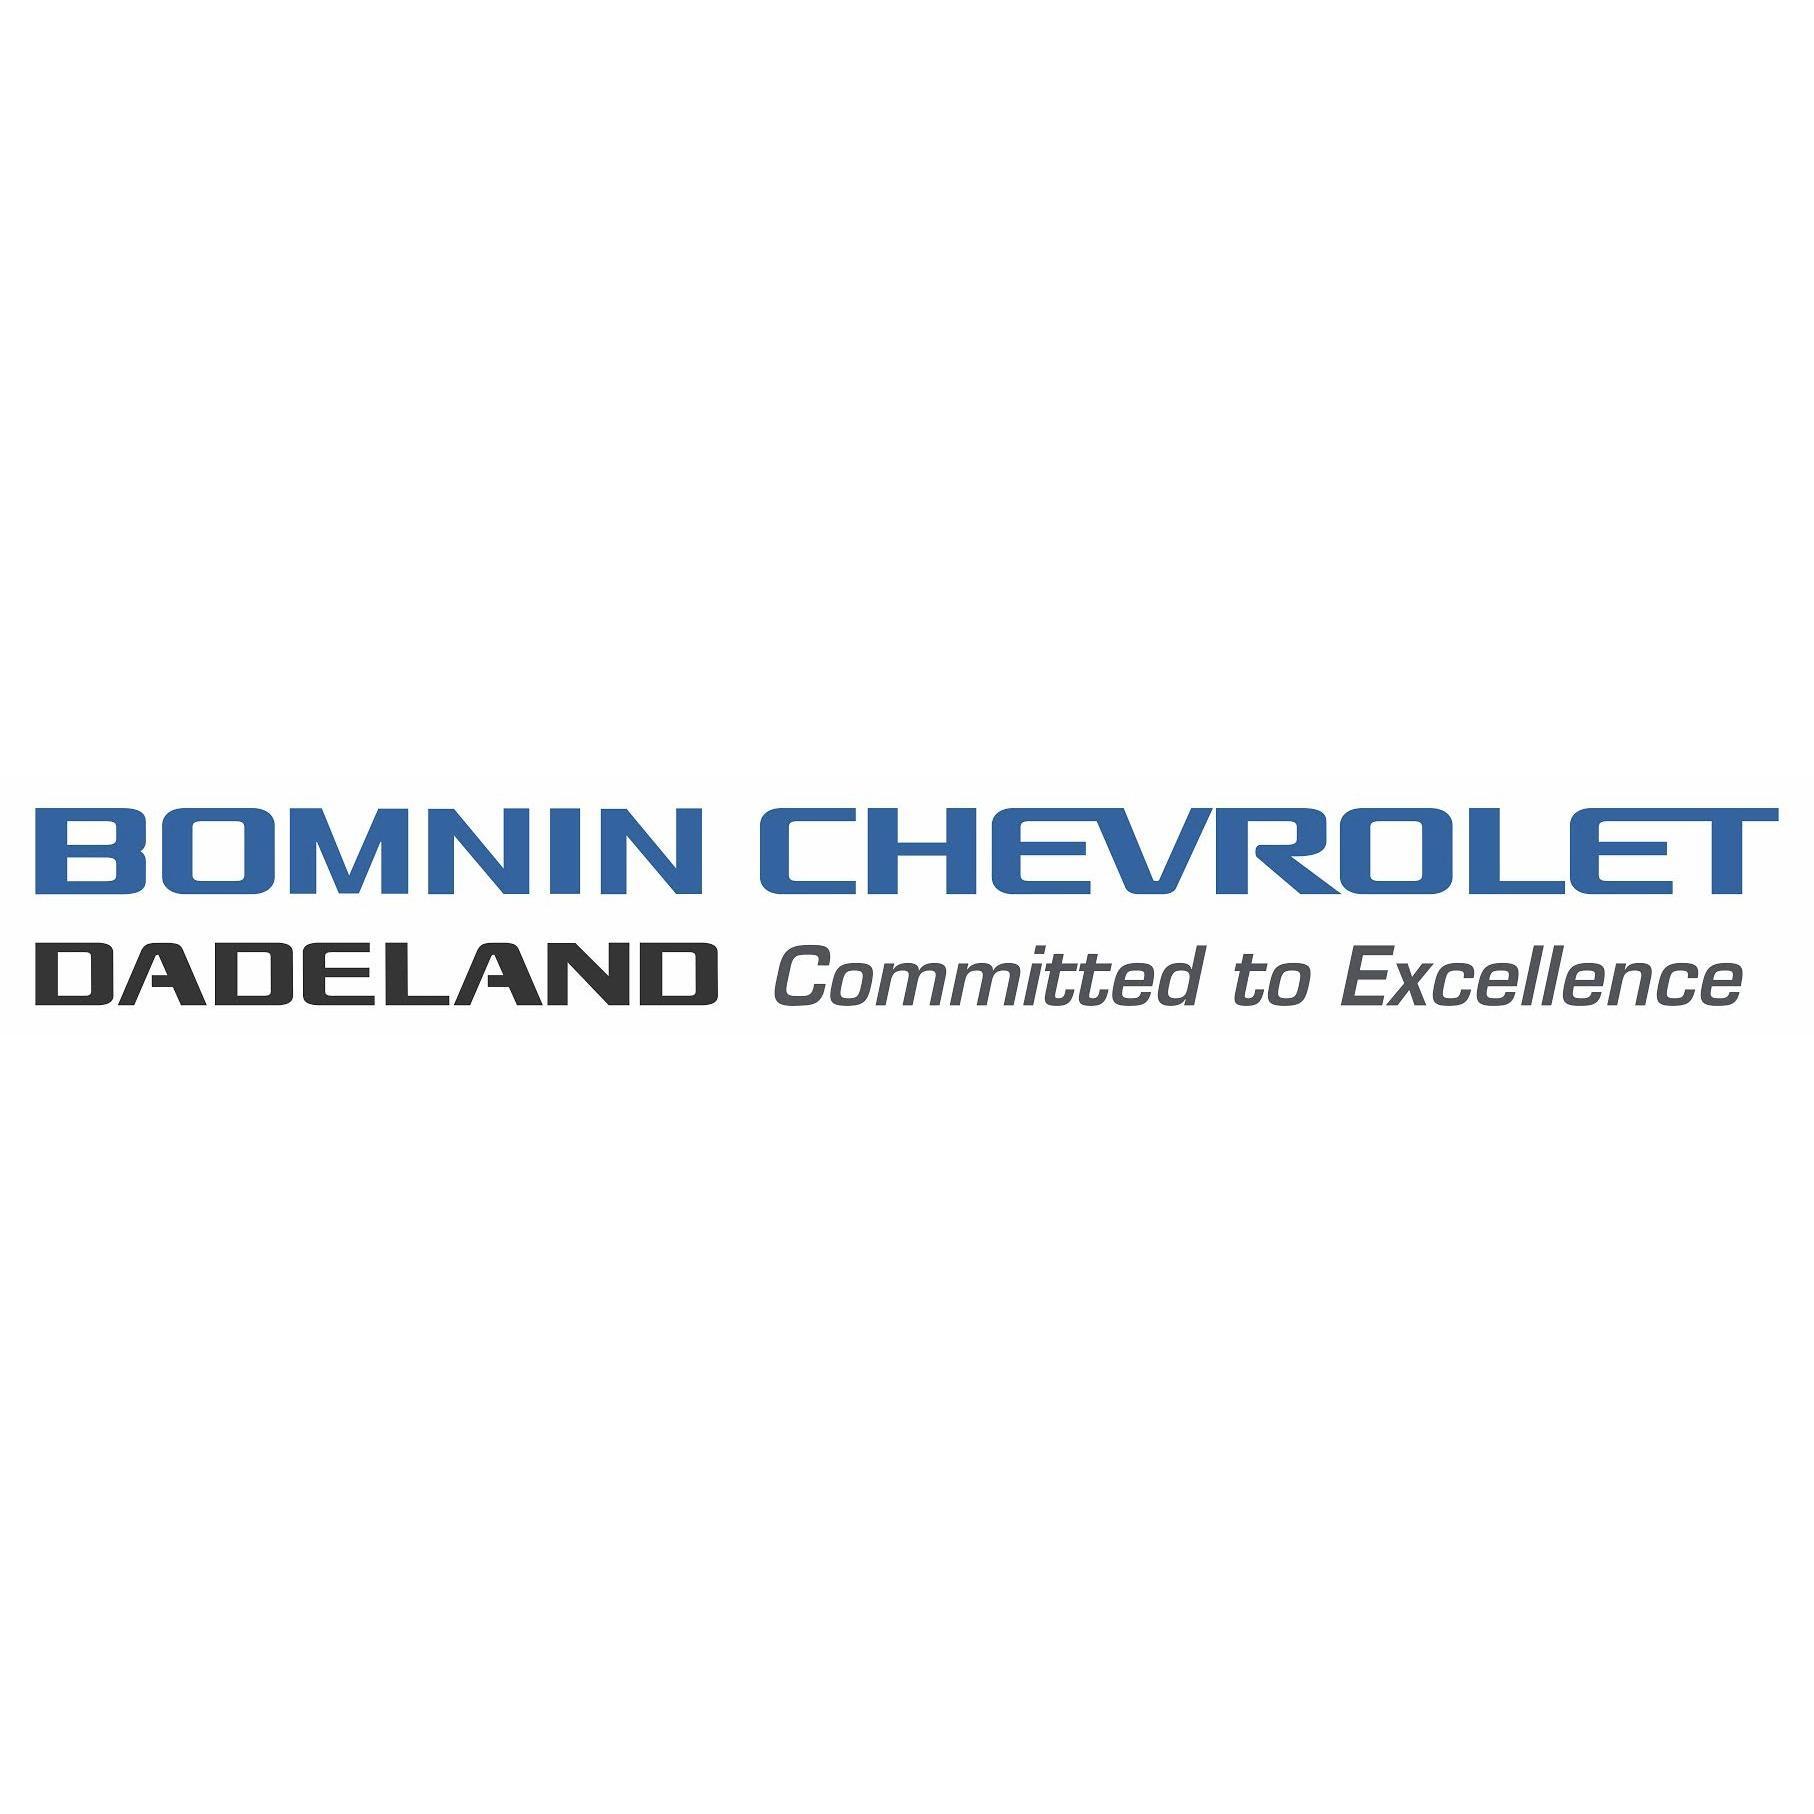 Bomnin Chevrolet Dadeland